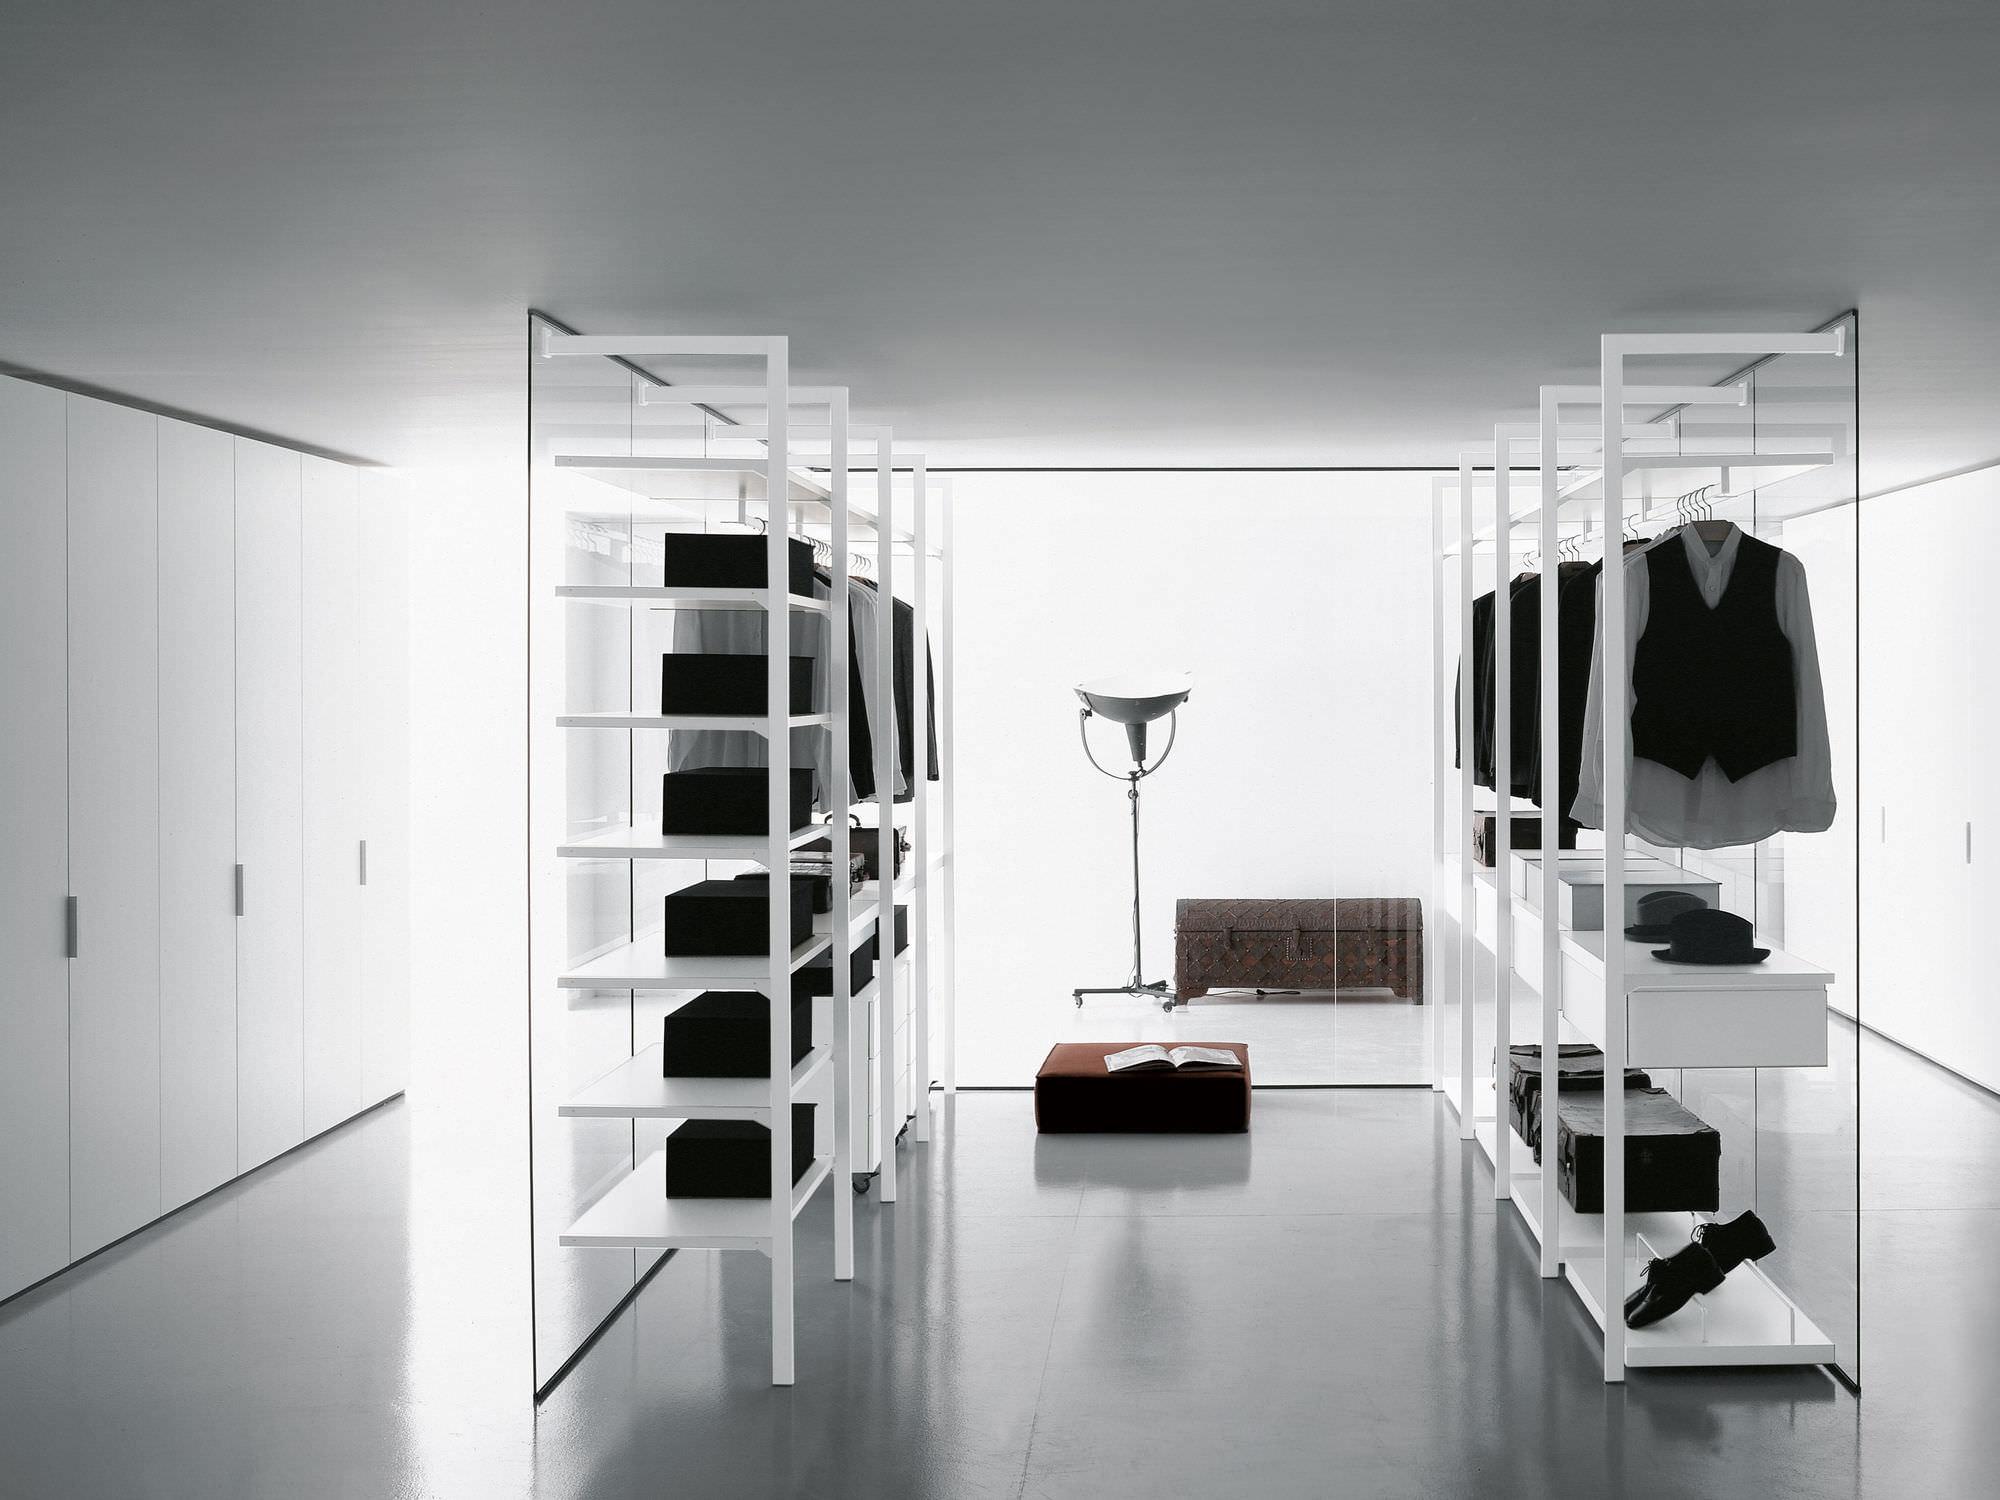 Kleiderschrank Modern Design | flamencon.com